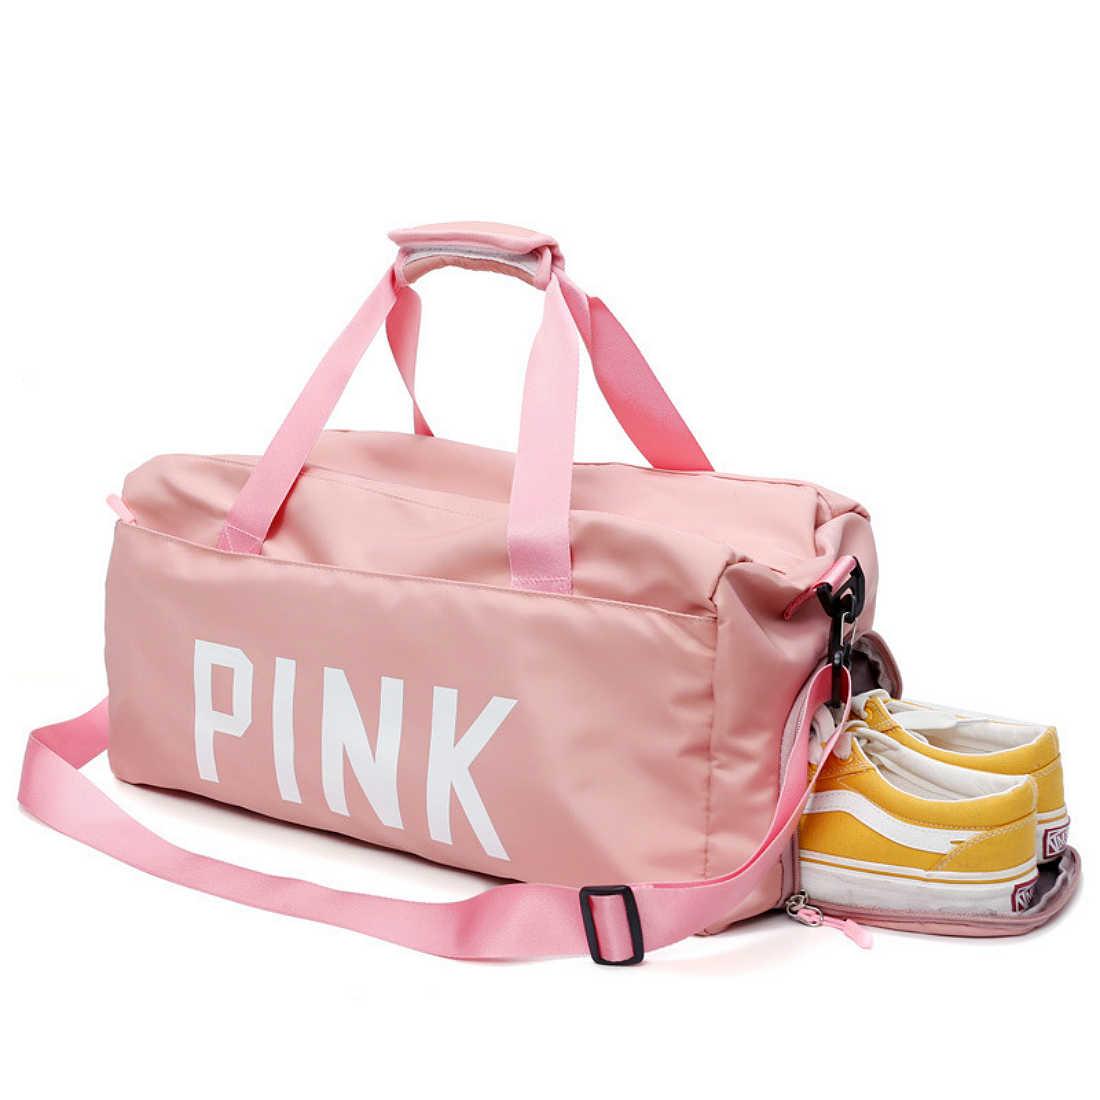 2018 black pink Print Outdoor Waterproof Nylon Sports Gym Bags Men Women  Girls Training Fitness Travel d07257e97033b